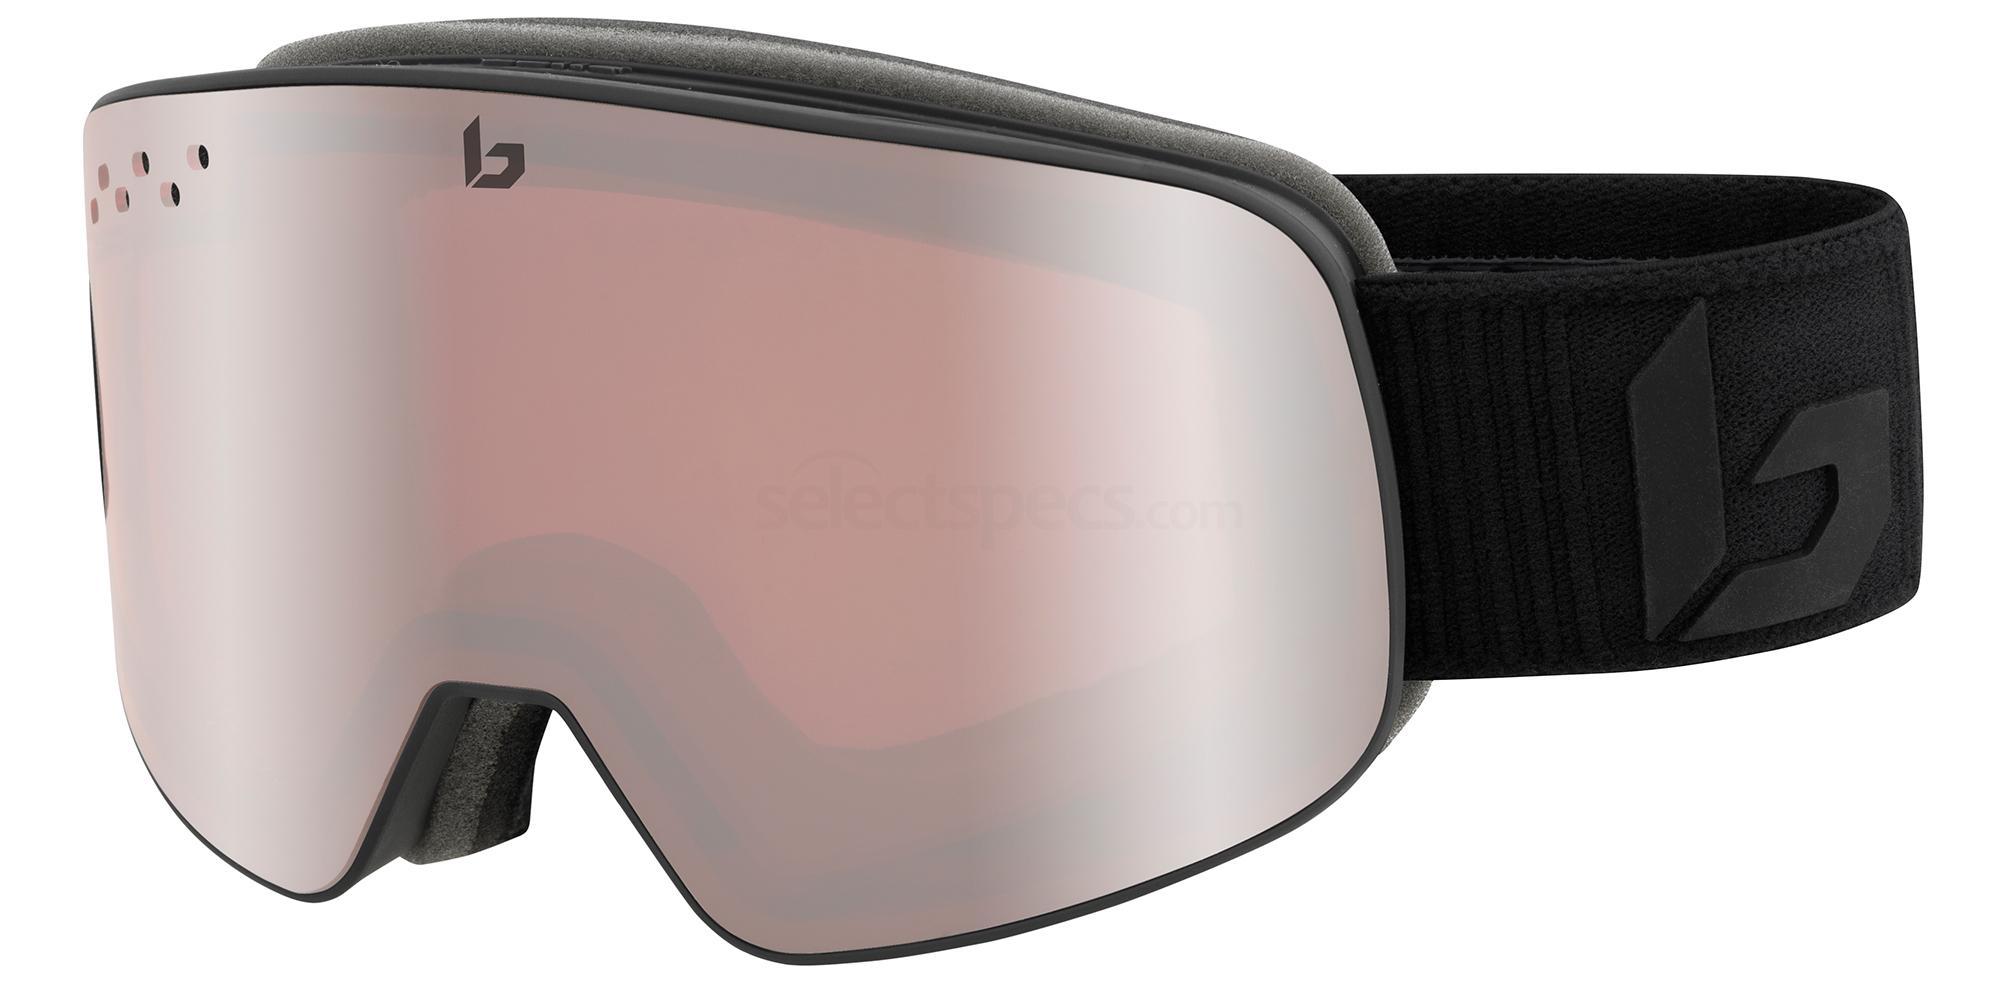 21922 NEVADA Goggles, Bolle